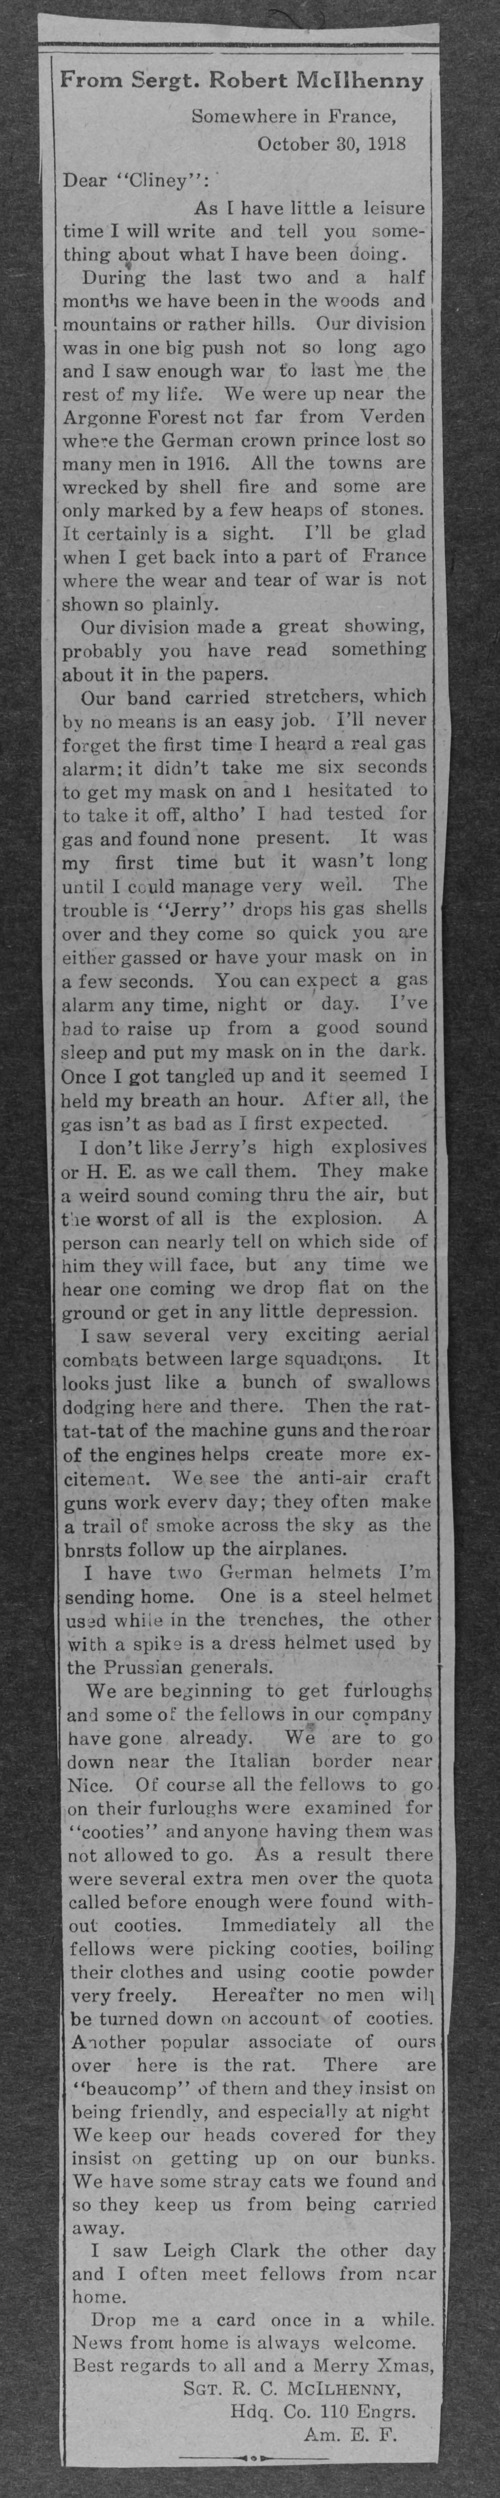 Robert C. McIlhenny, World War I soldier - Page